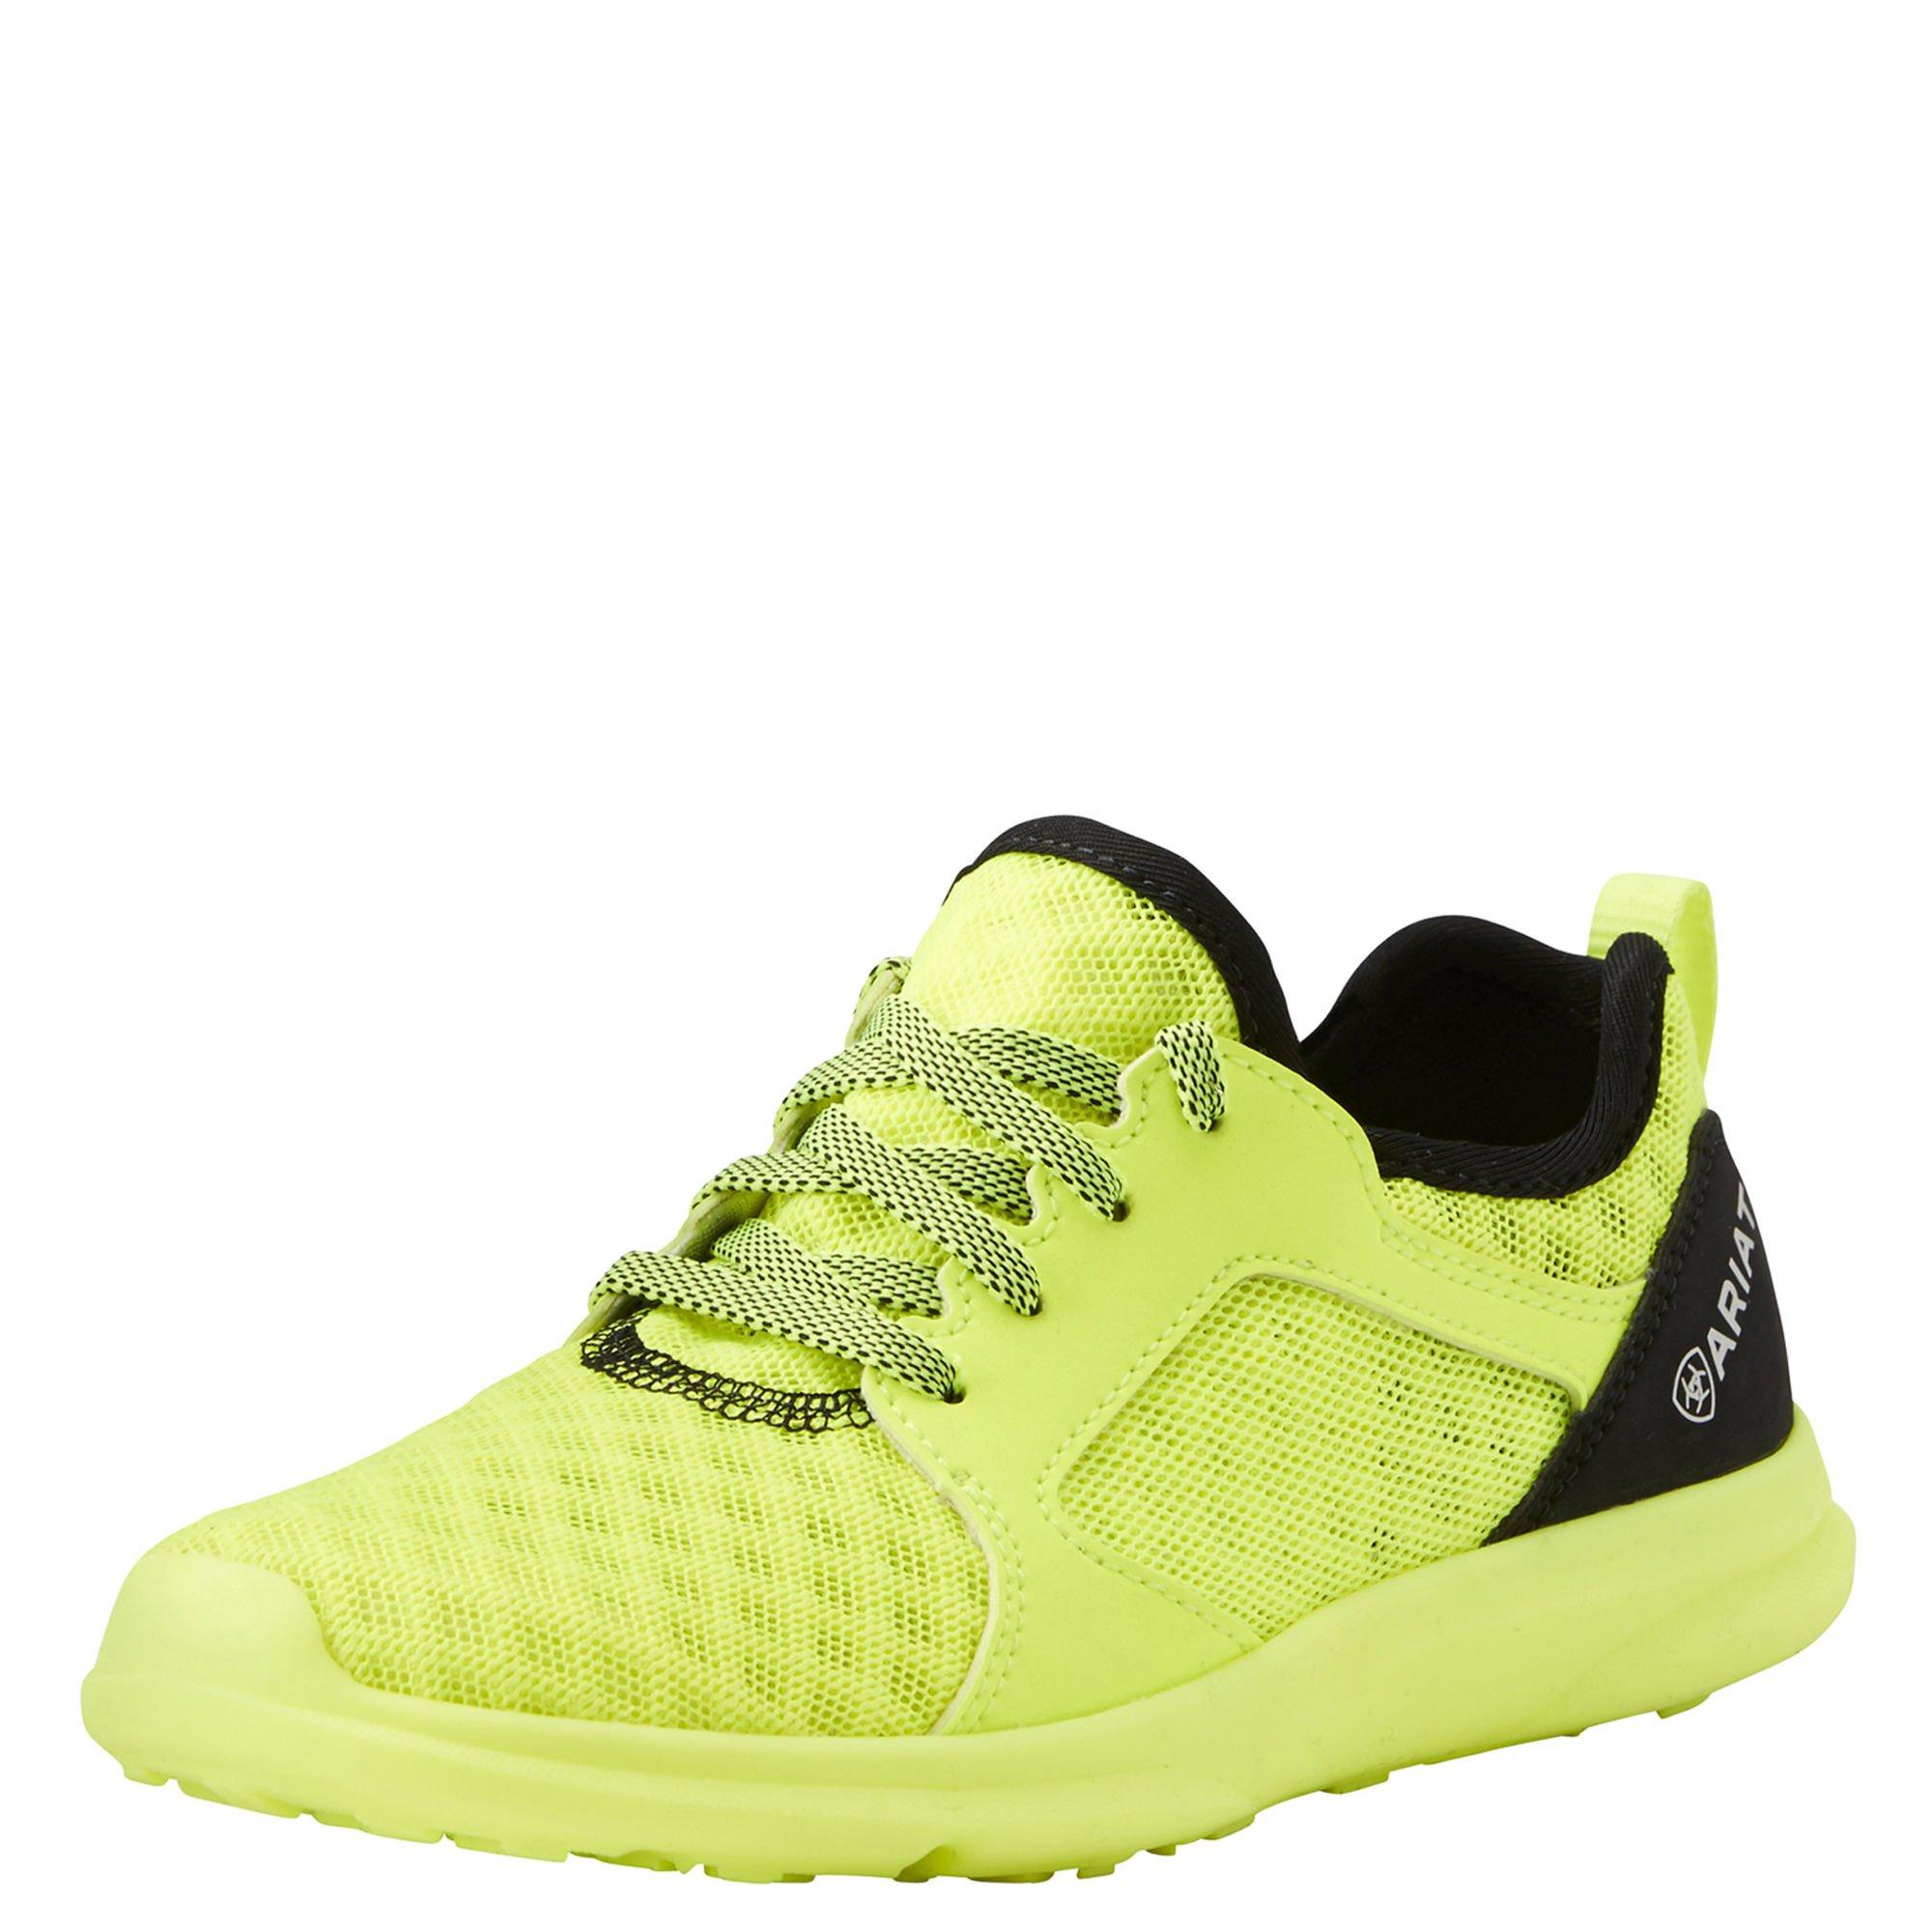 Ariat Kids' Fuse Athletic Shoe, Neon Yellow Mesh, 5 M US Big Kid